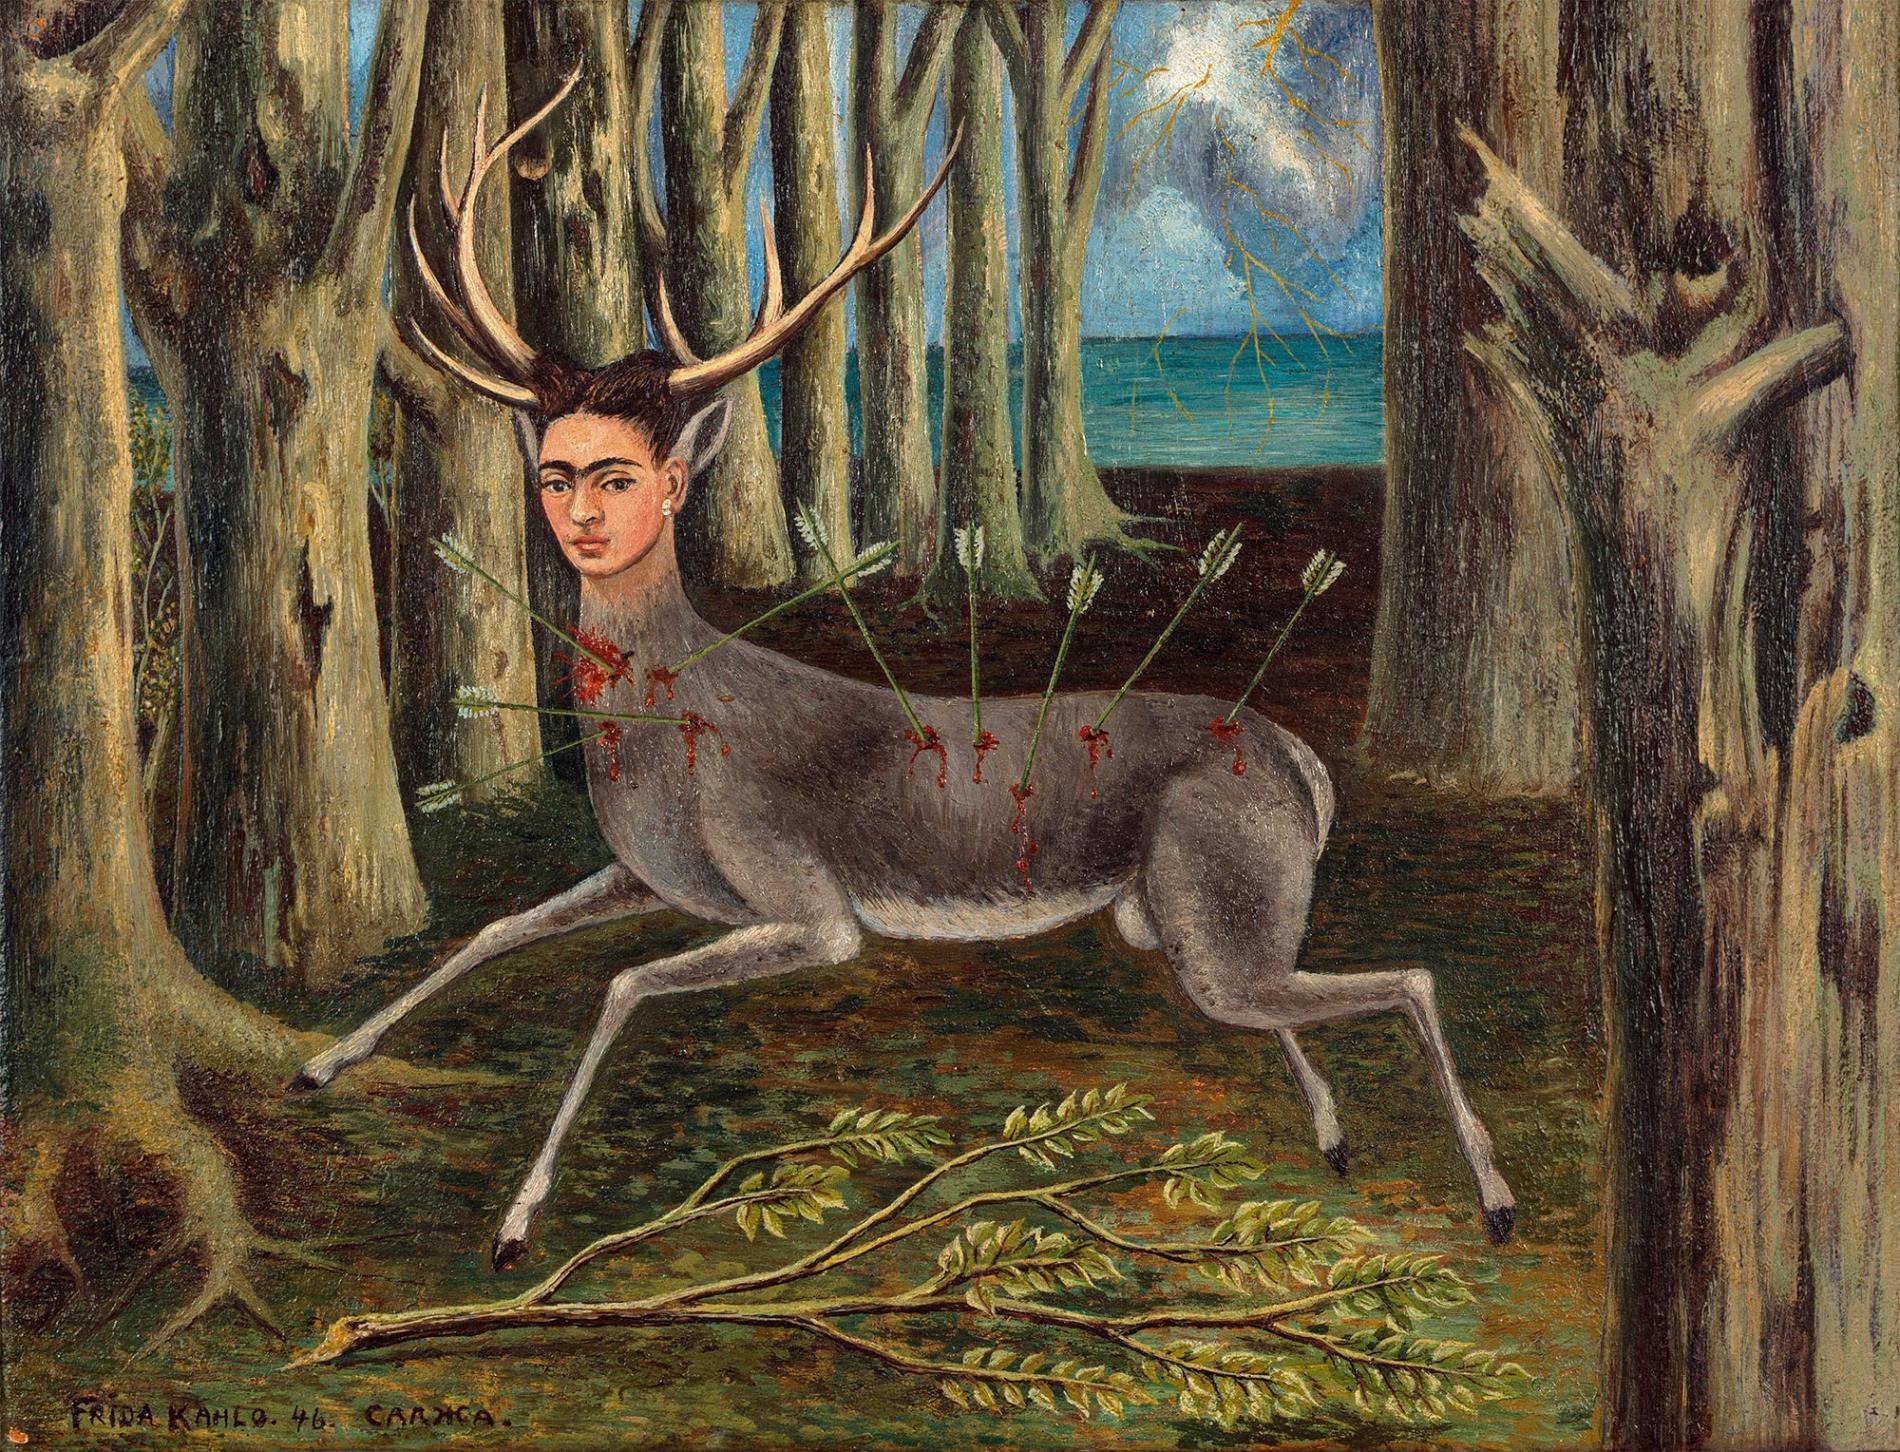 kahlo autoretrato The Little Dee